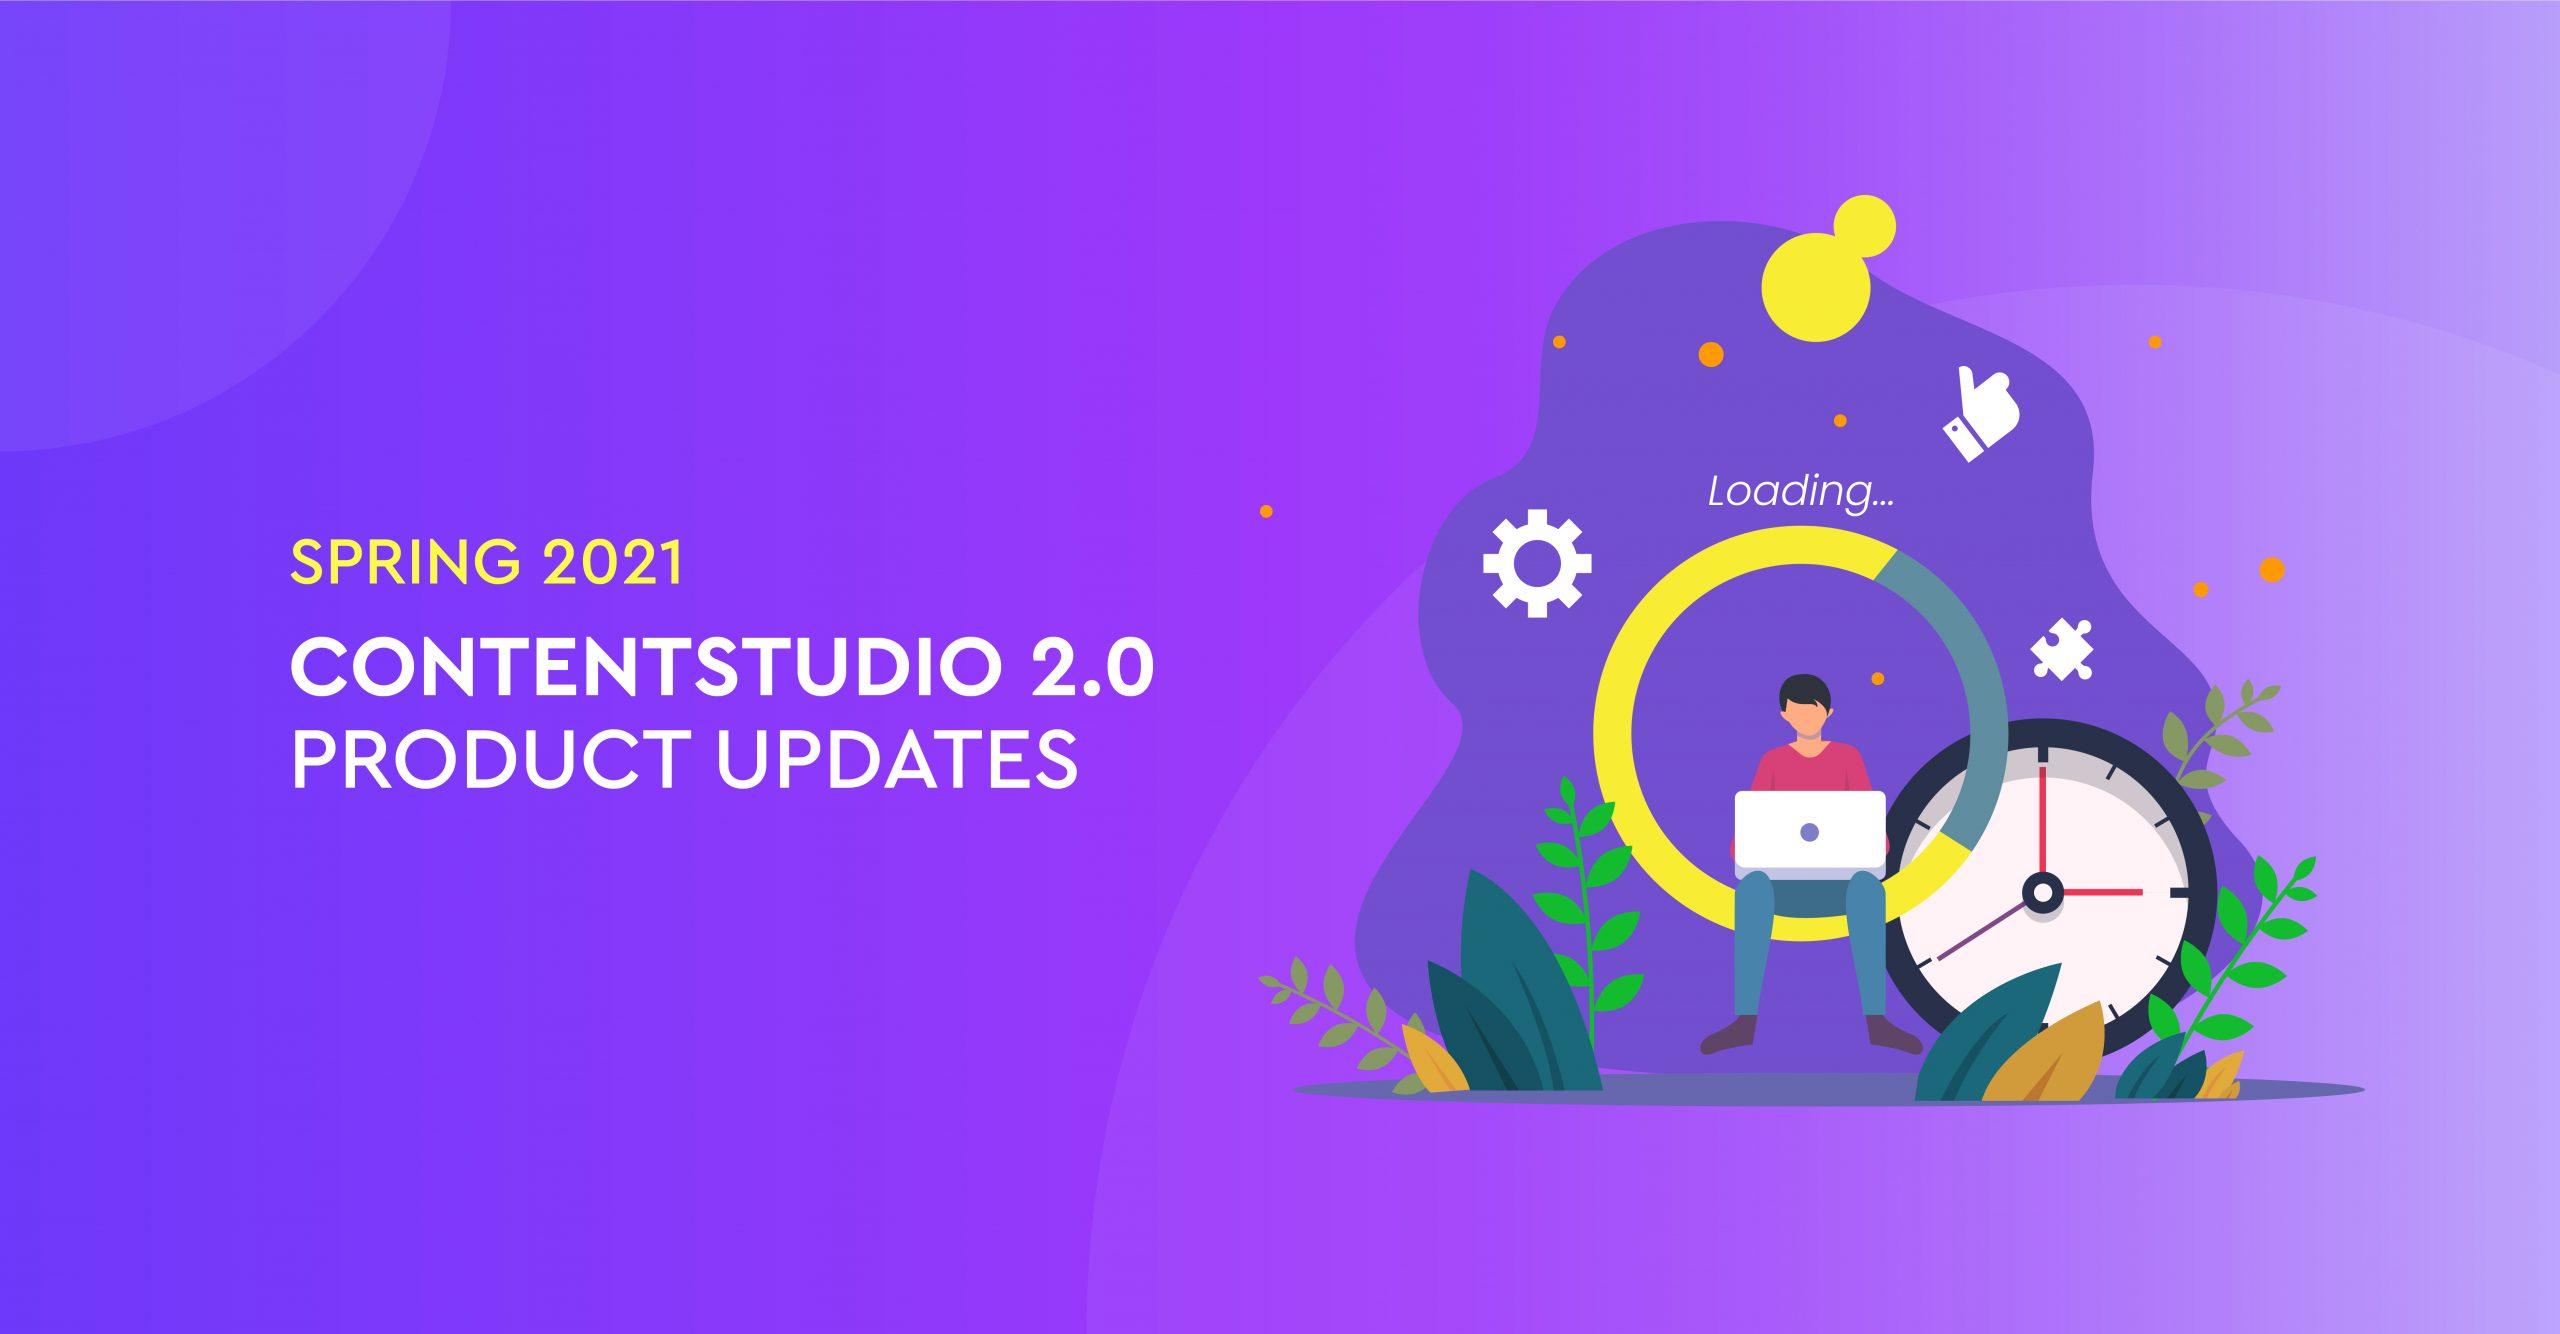 ContentStudio Product Updates